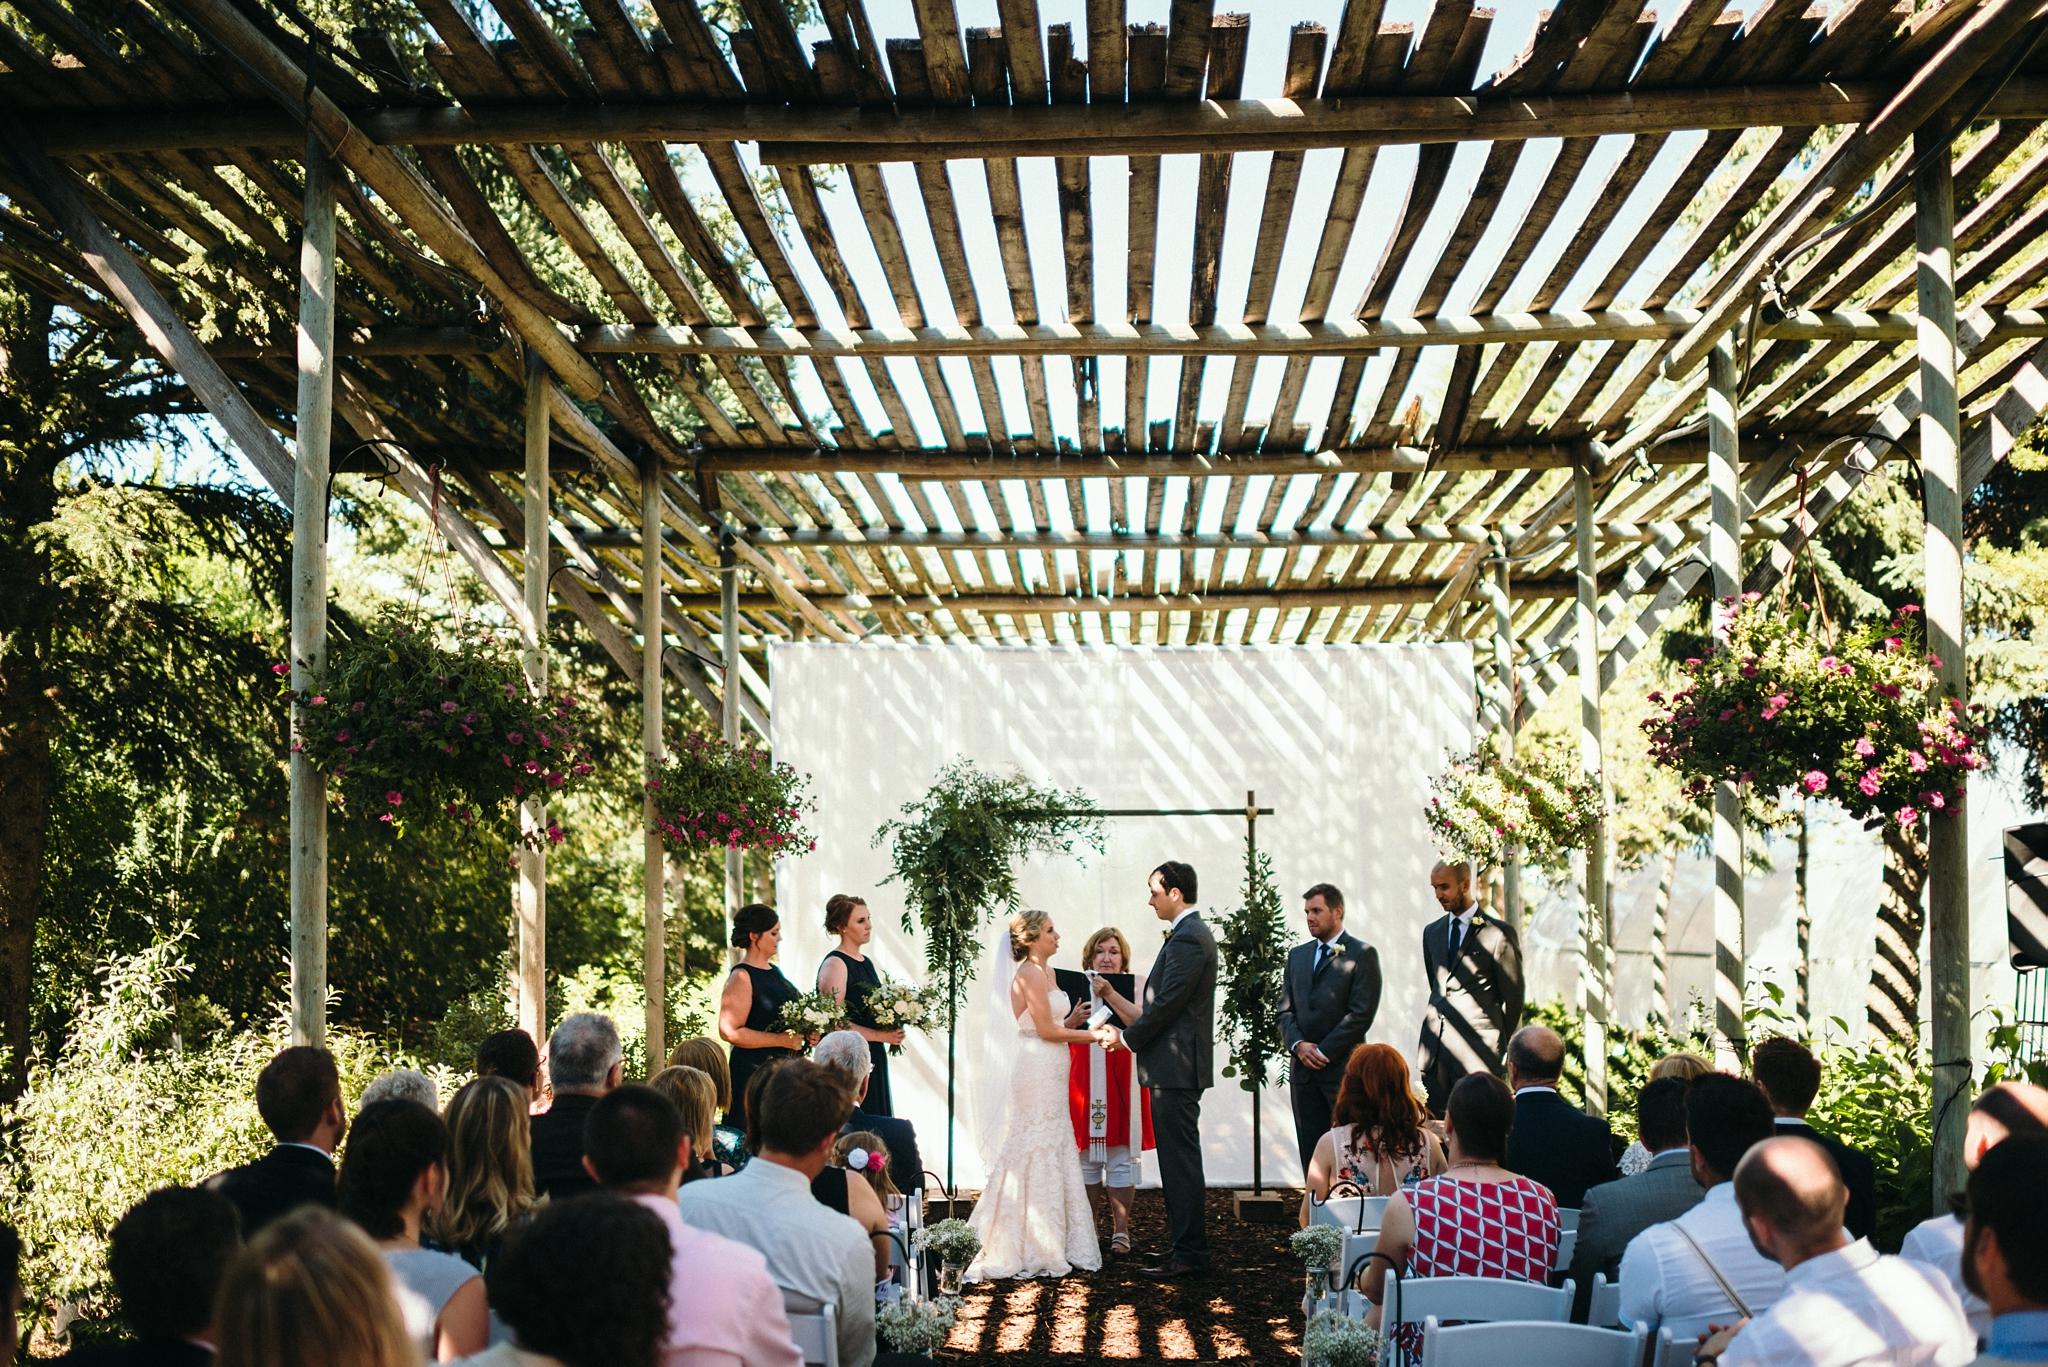 kaihla_tonai_intimate_wedding_elopement_photographer_4350